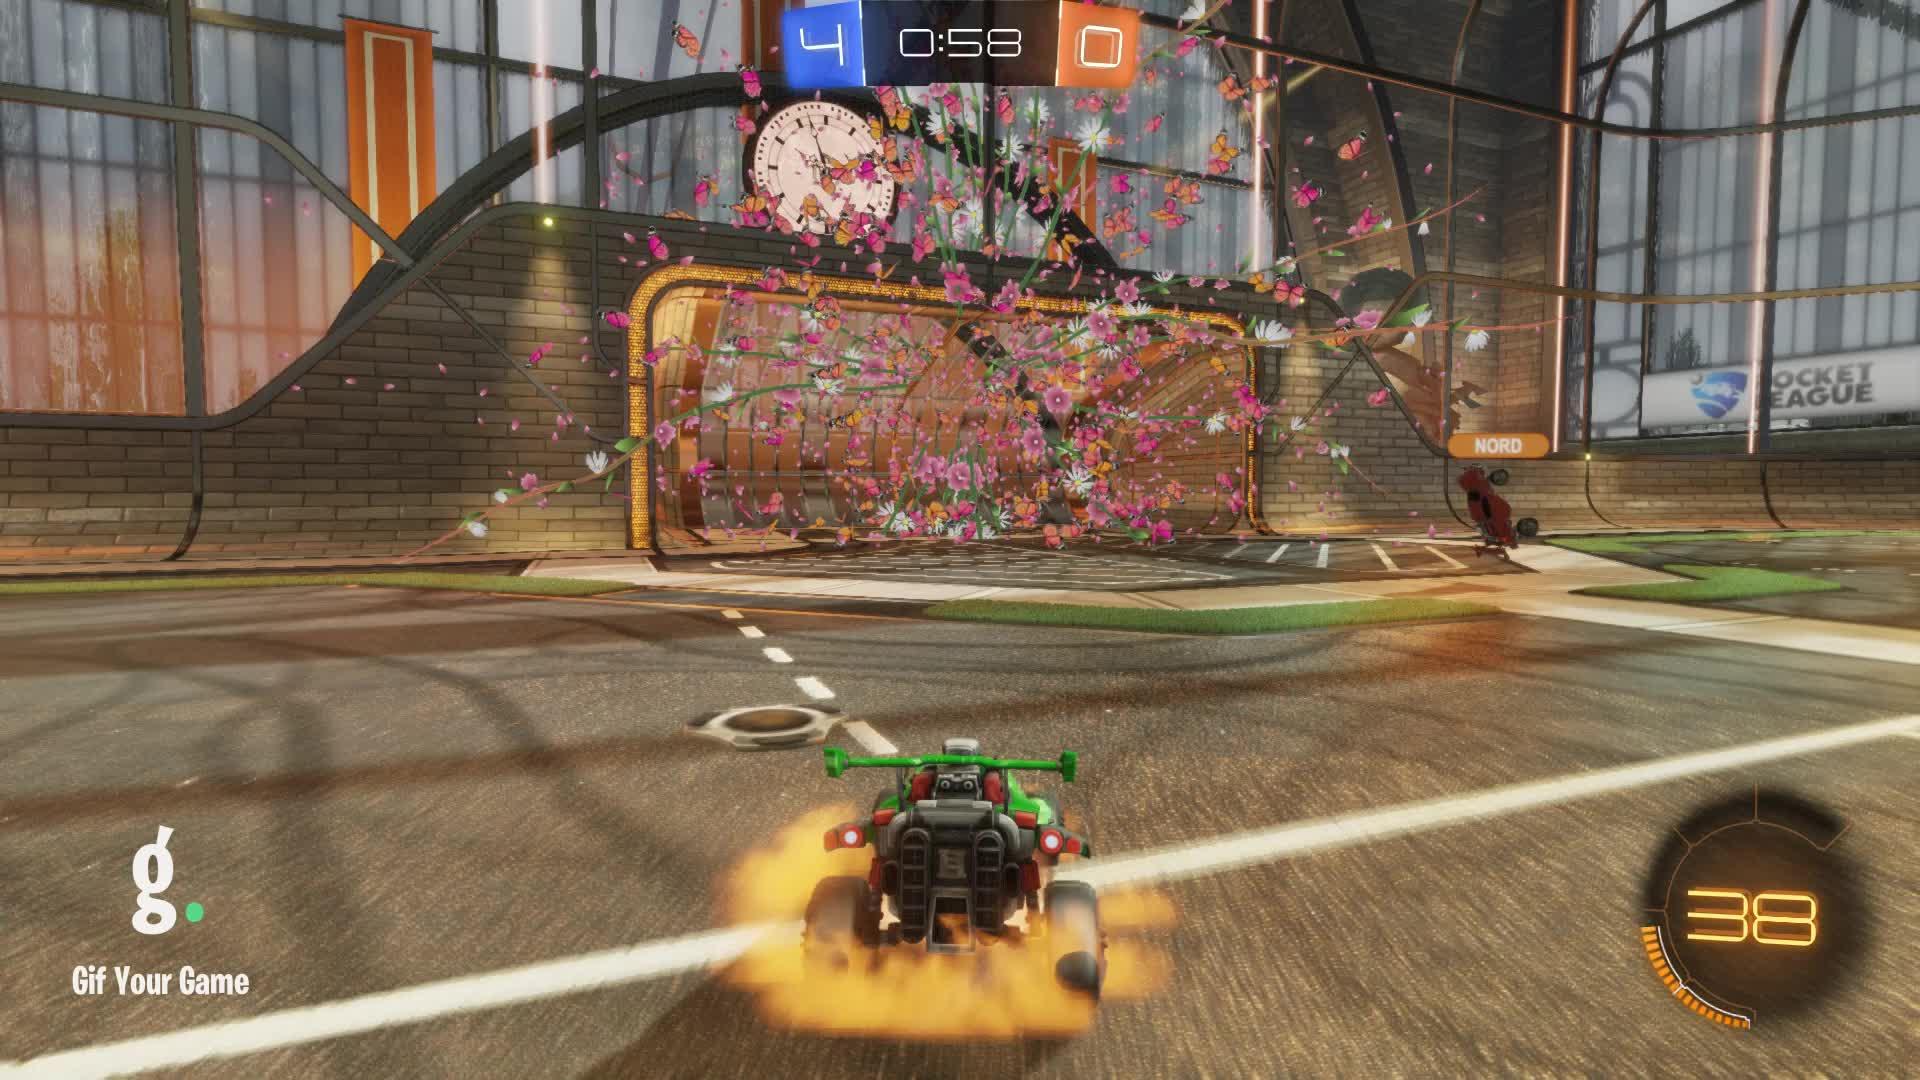 Gif Your Game, GifYourGame, Rocket League, RocketLeague, datboi, Goal 5: datboi GIFs